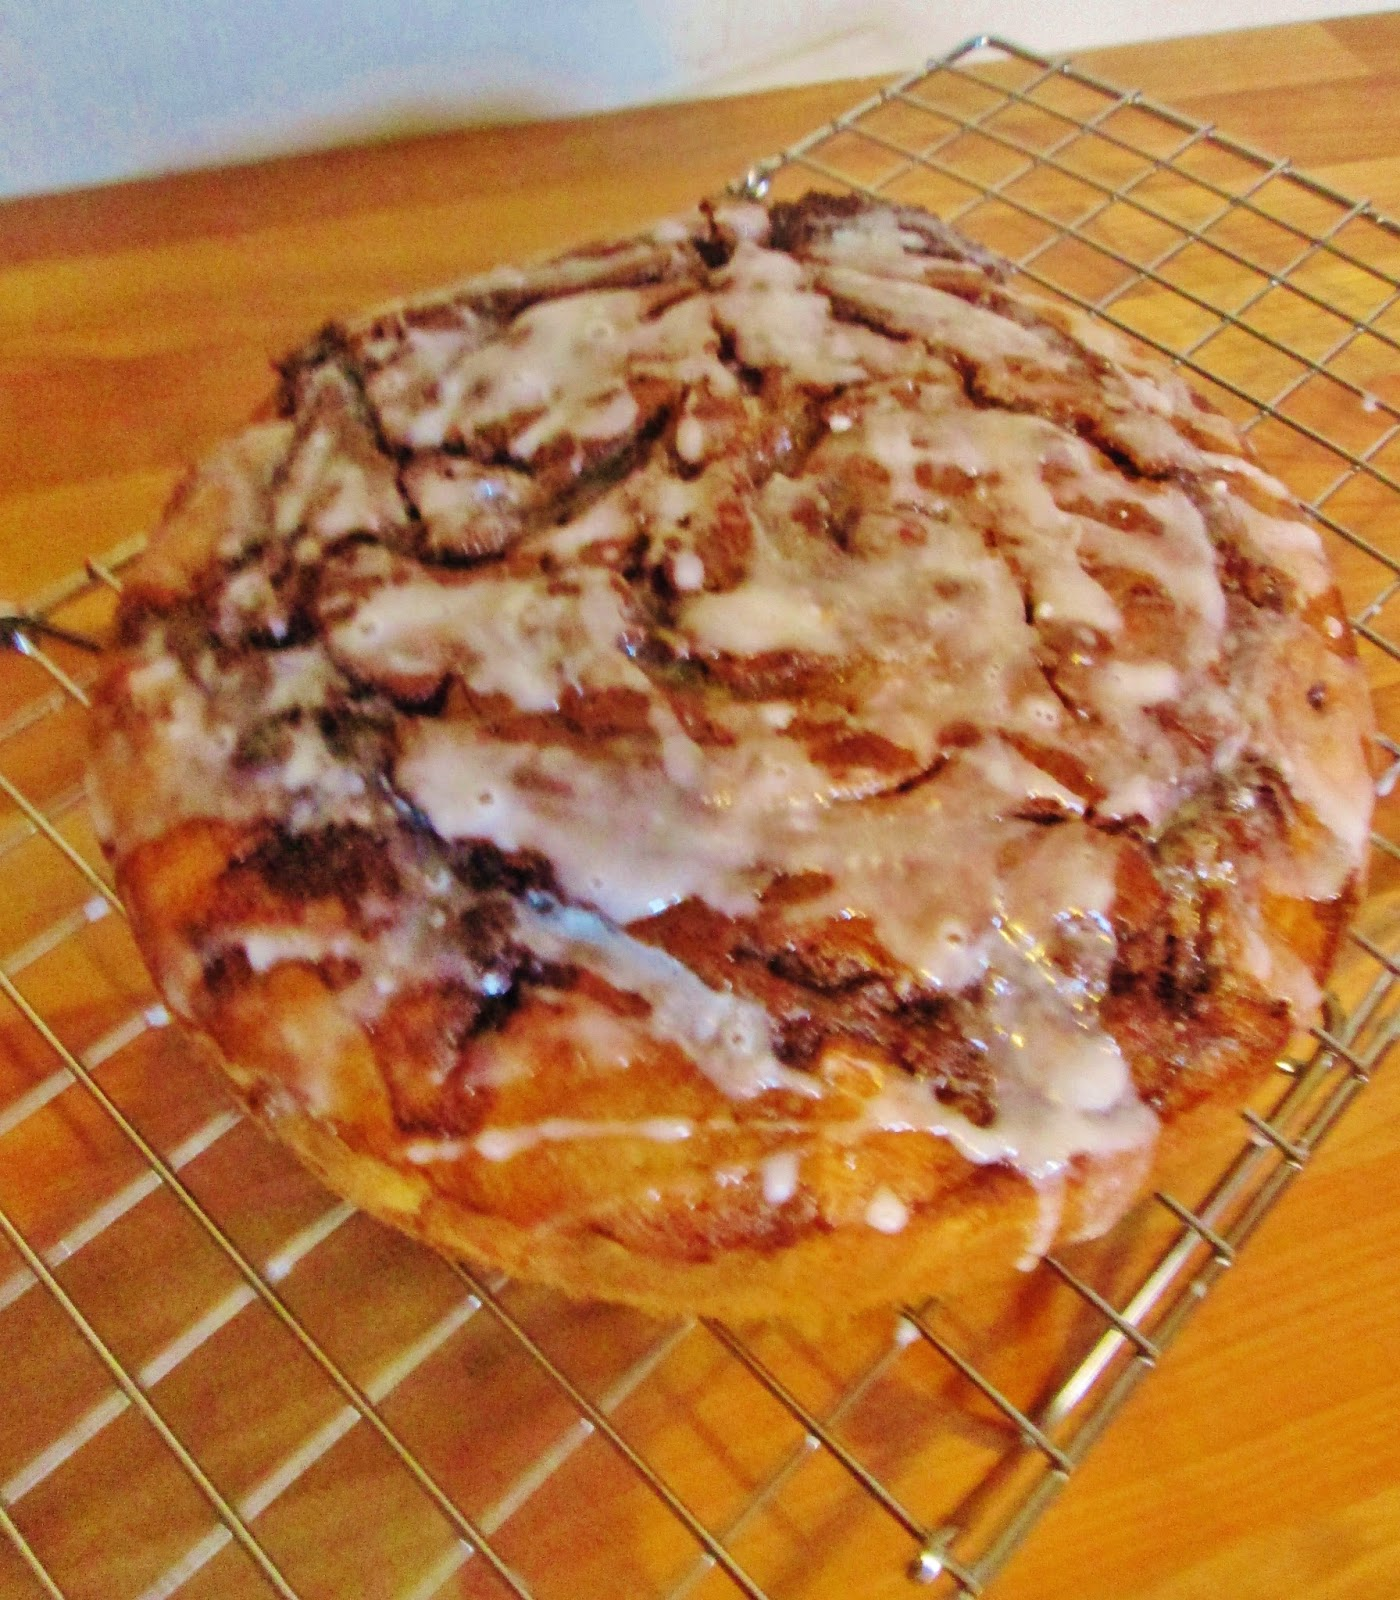 themessykitchenuk.blogspot.co.uk/2014/06/cinnamon-bun-cake.html